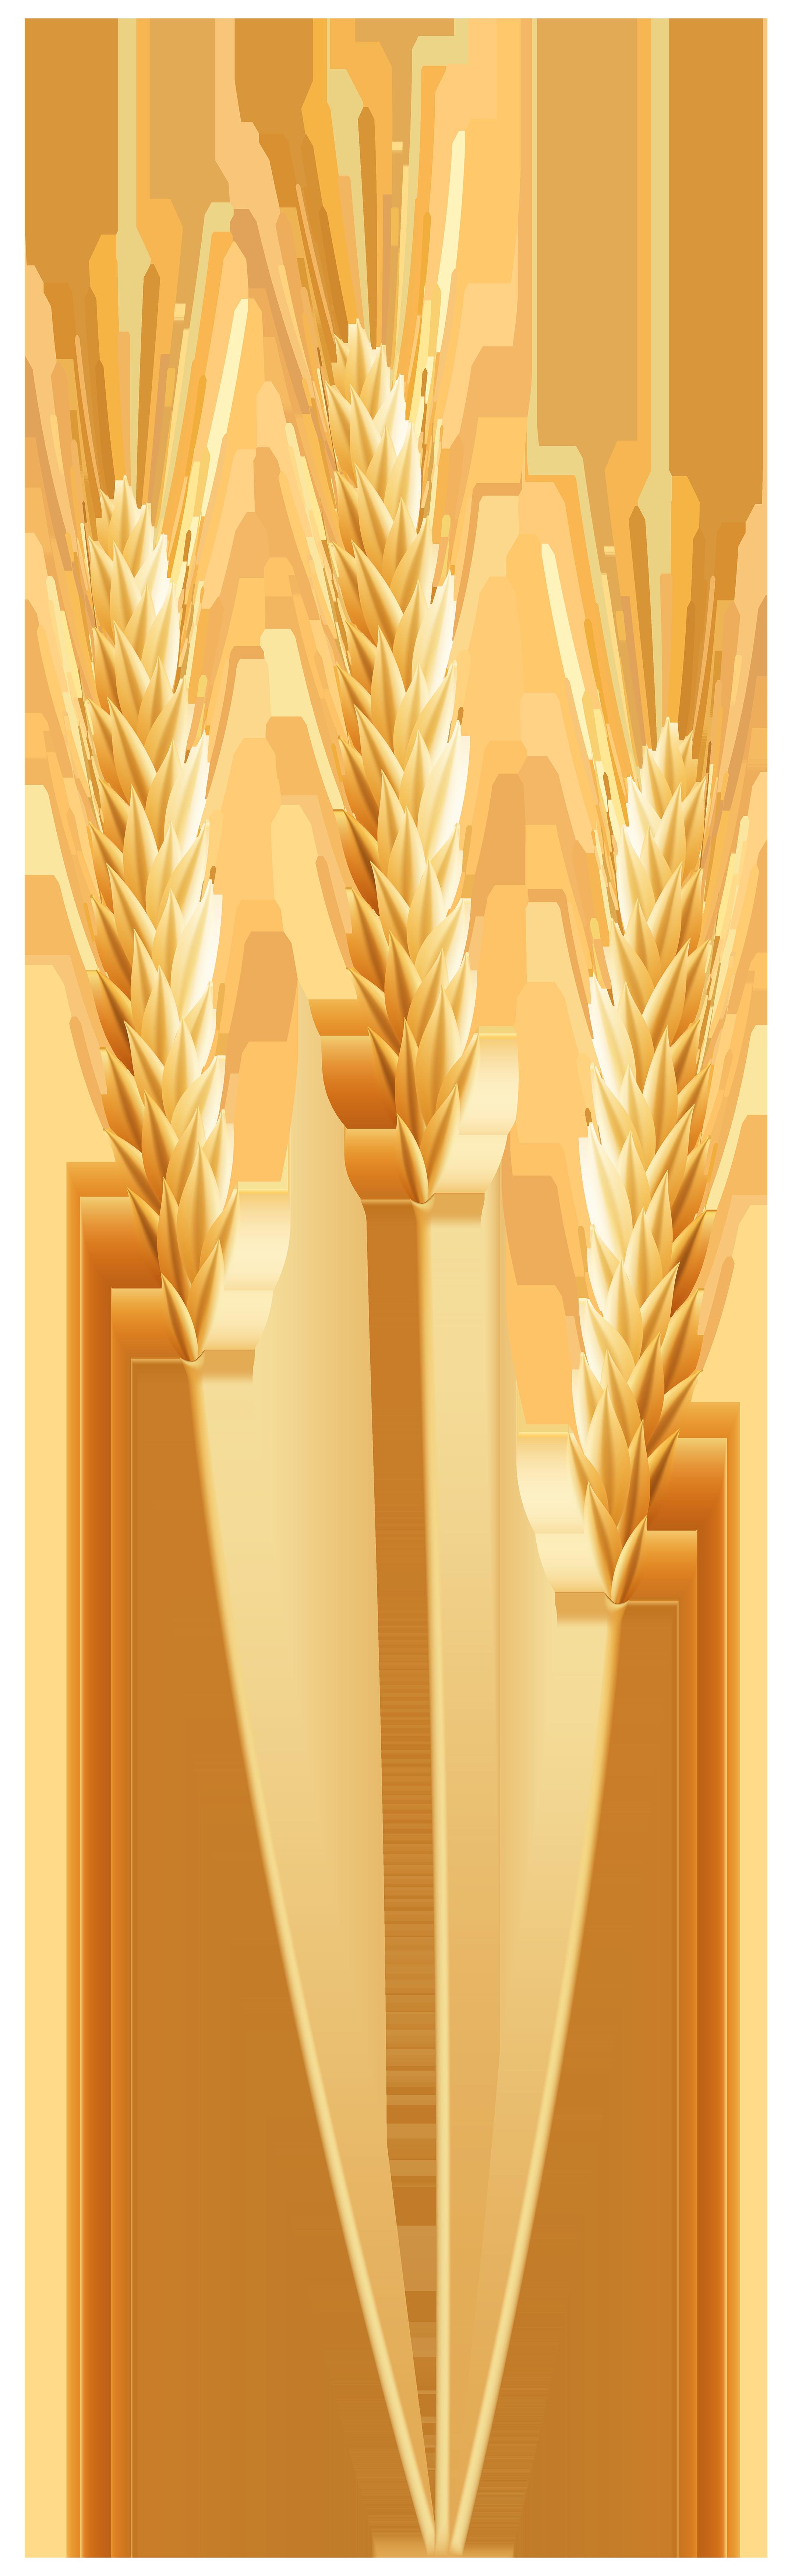 Hops clipart wheat. Png clip art image